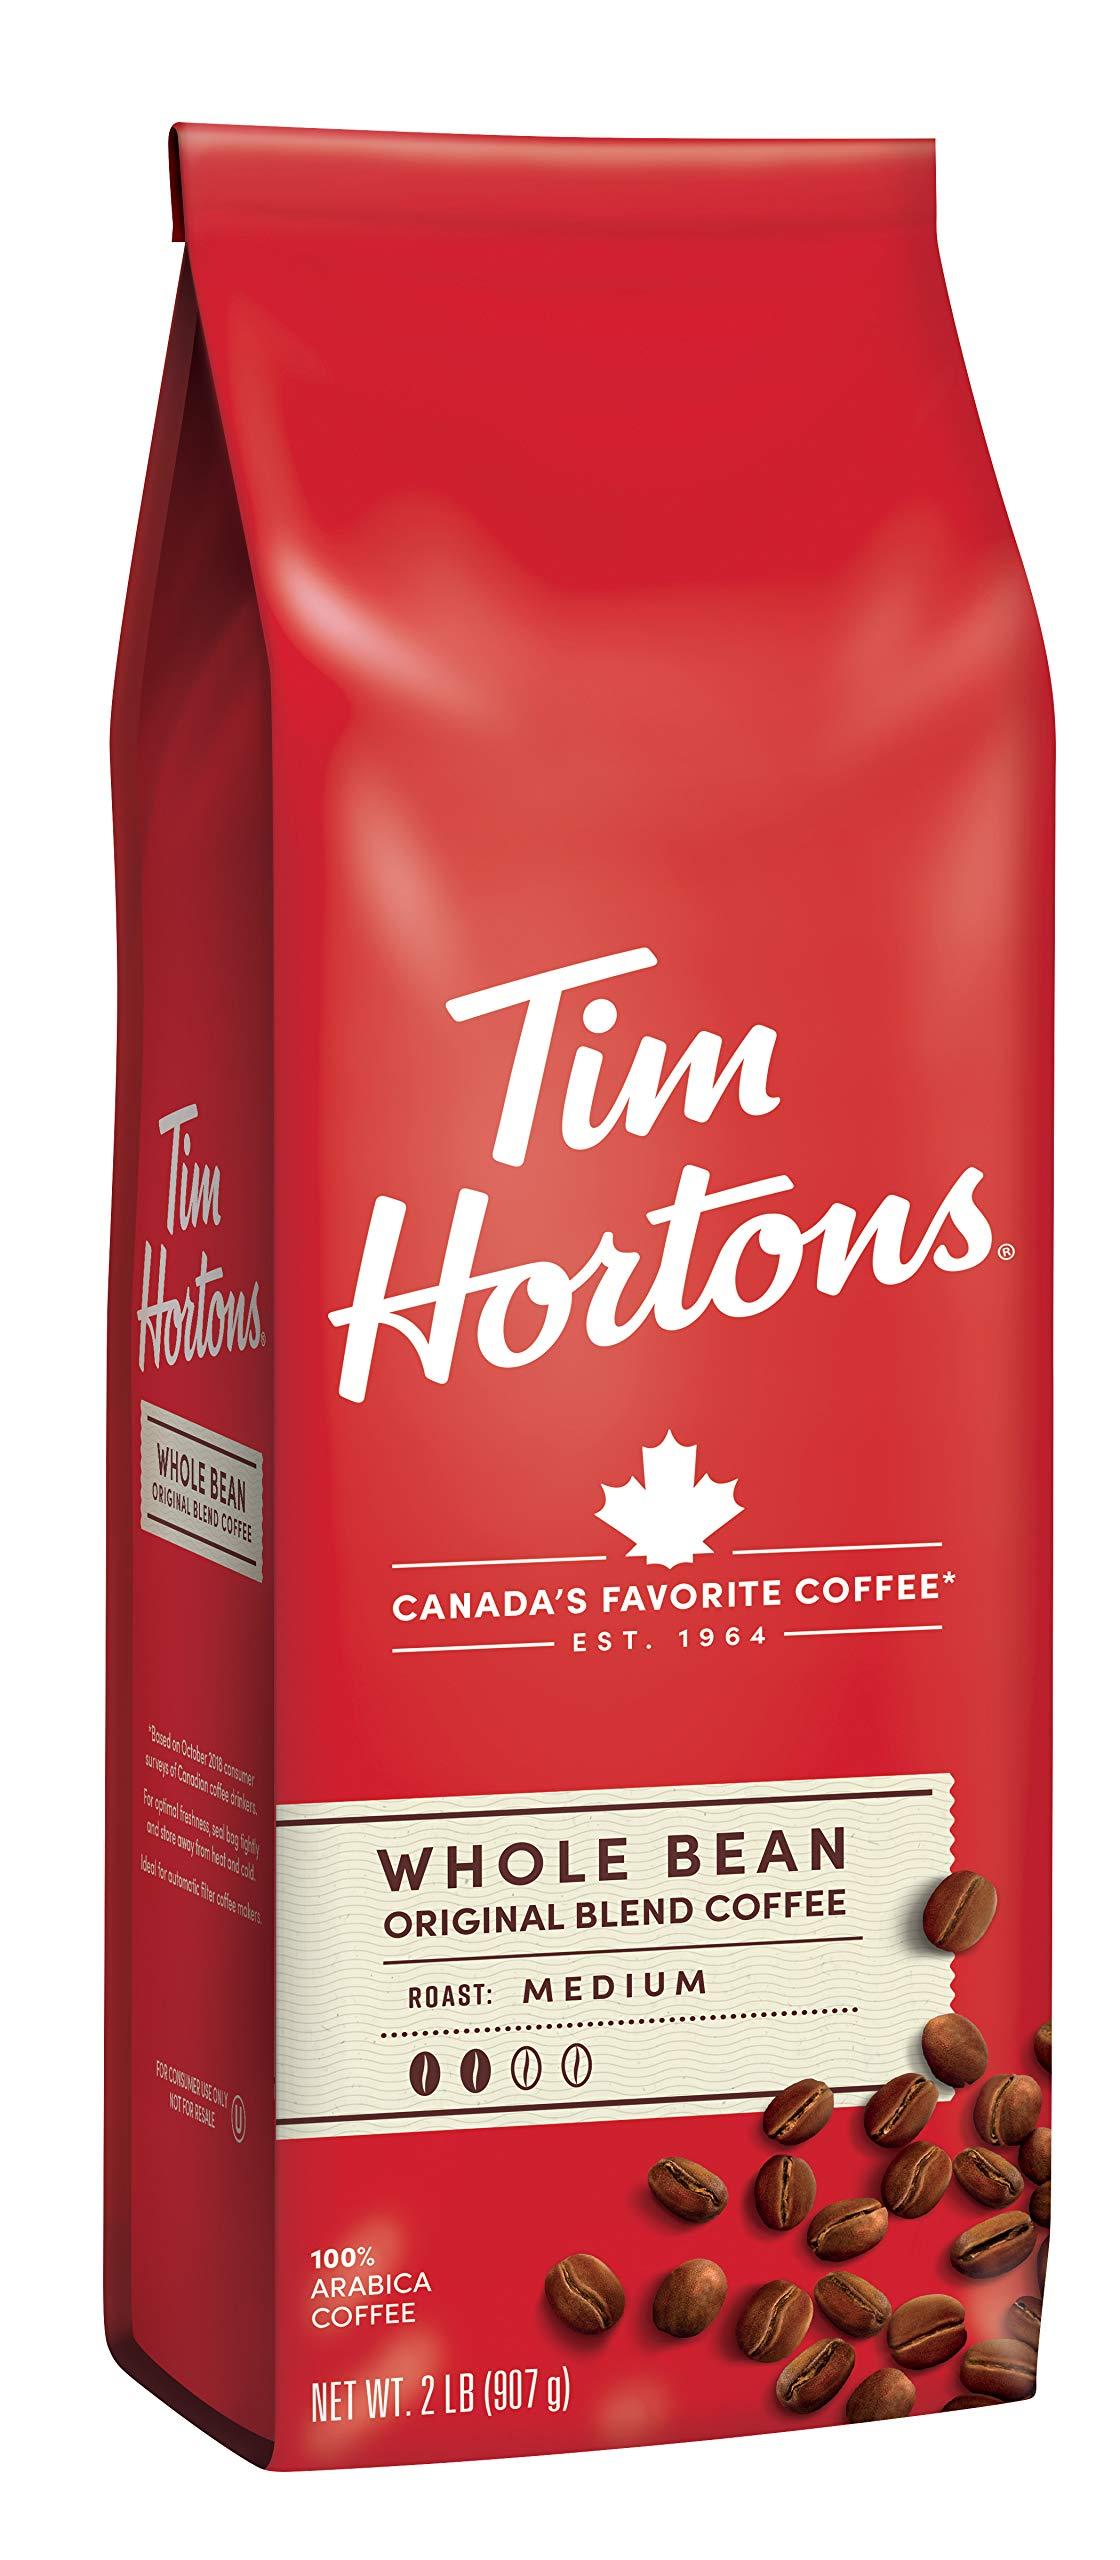 Tim Hortons Whole Bean Original, Medium Roast Coffee, Made with 100% Arabica Beans, 32 Ounce Bag